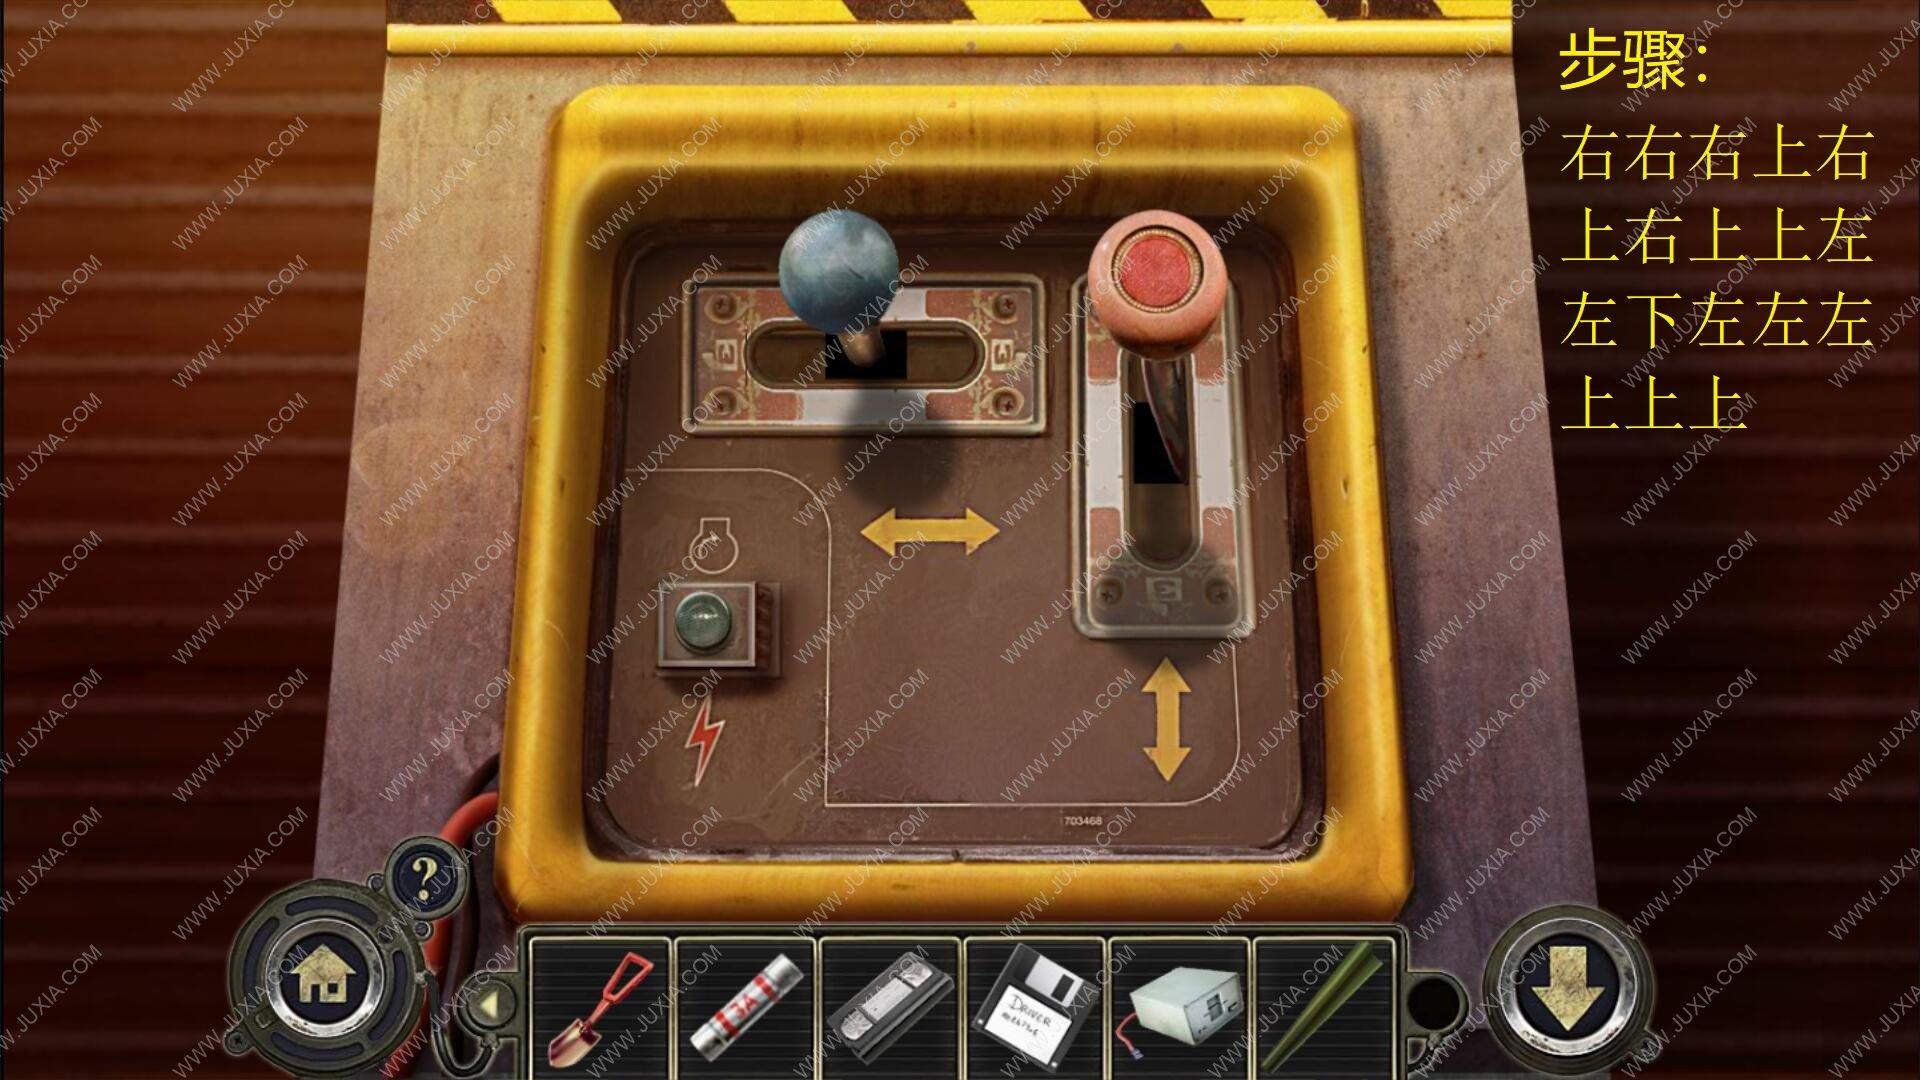 Facility47攻略第六关图文 47号房间攻略第6关试管怎么搭配